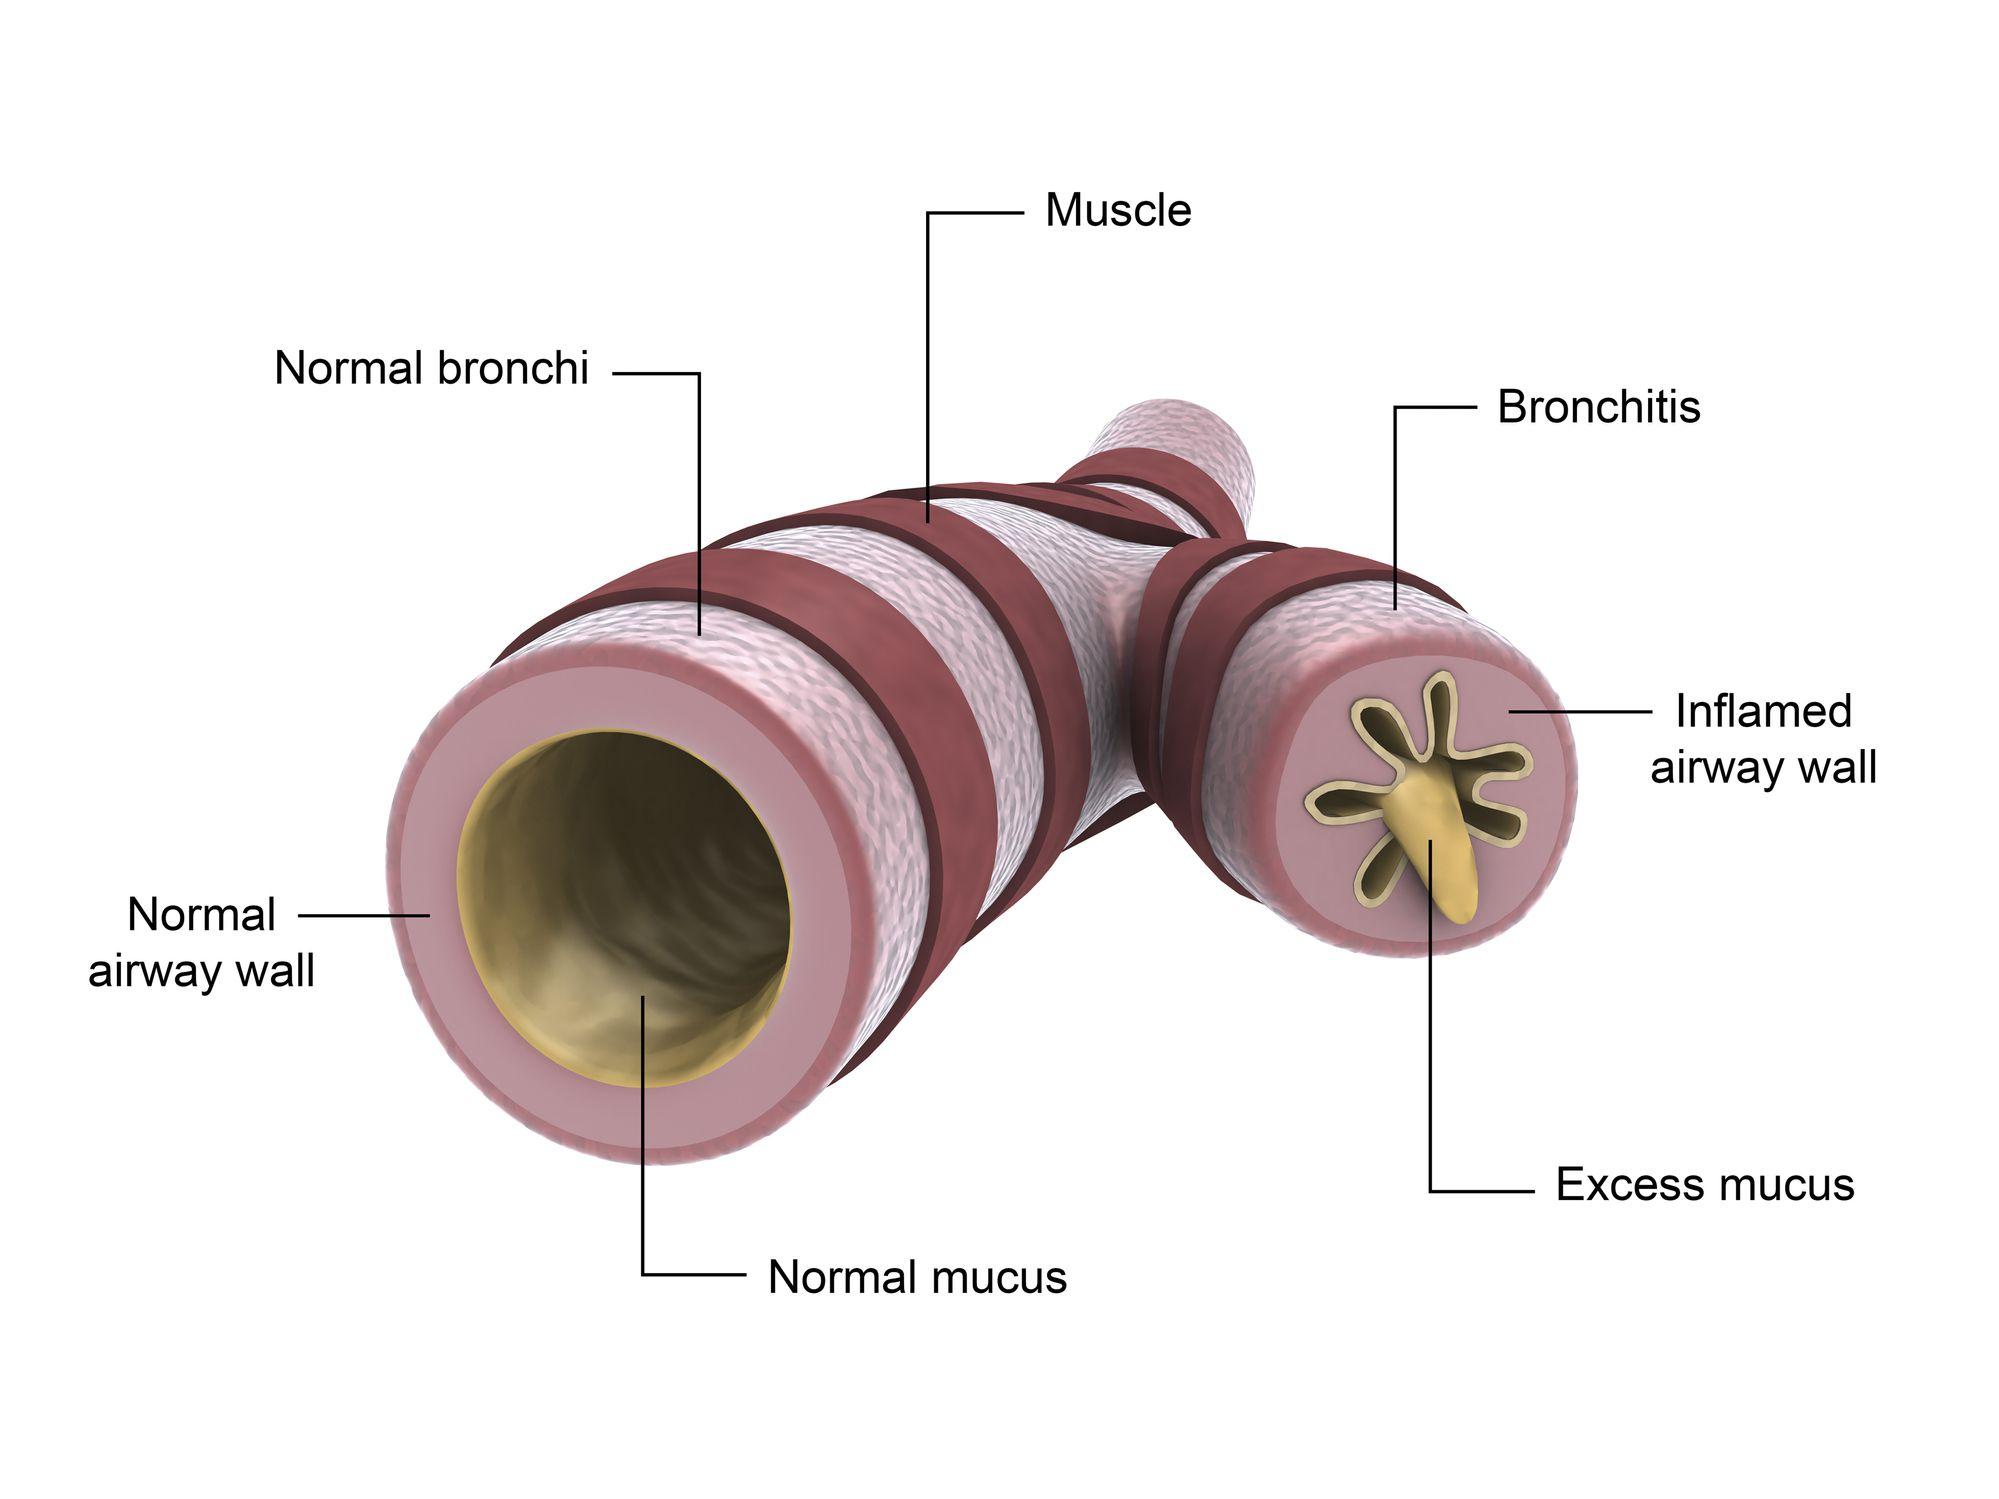 Medical illustration of bronchitis